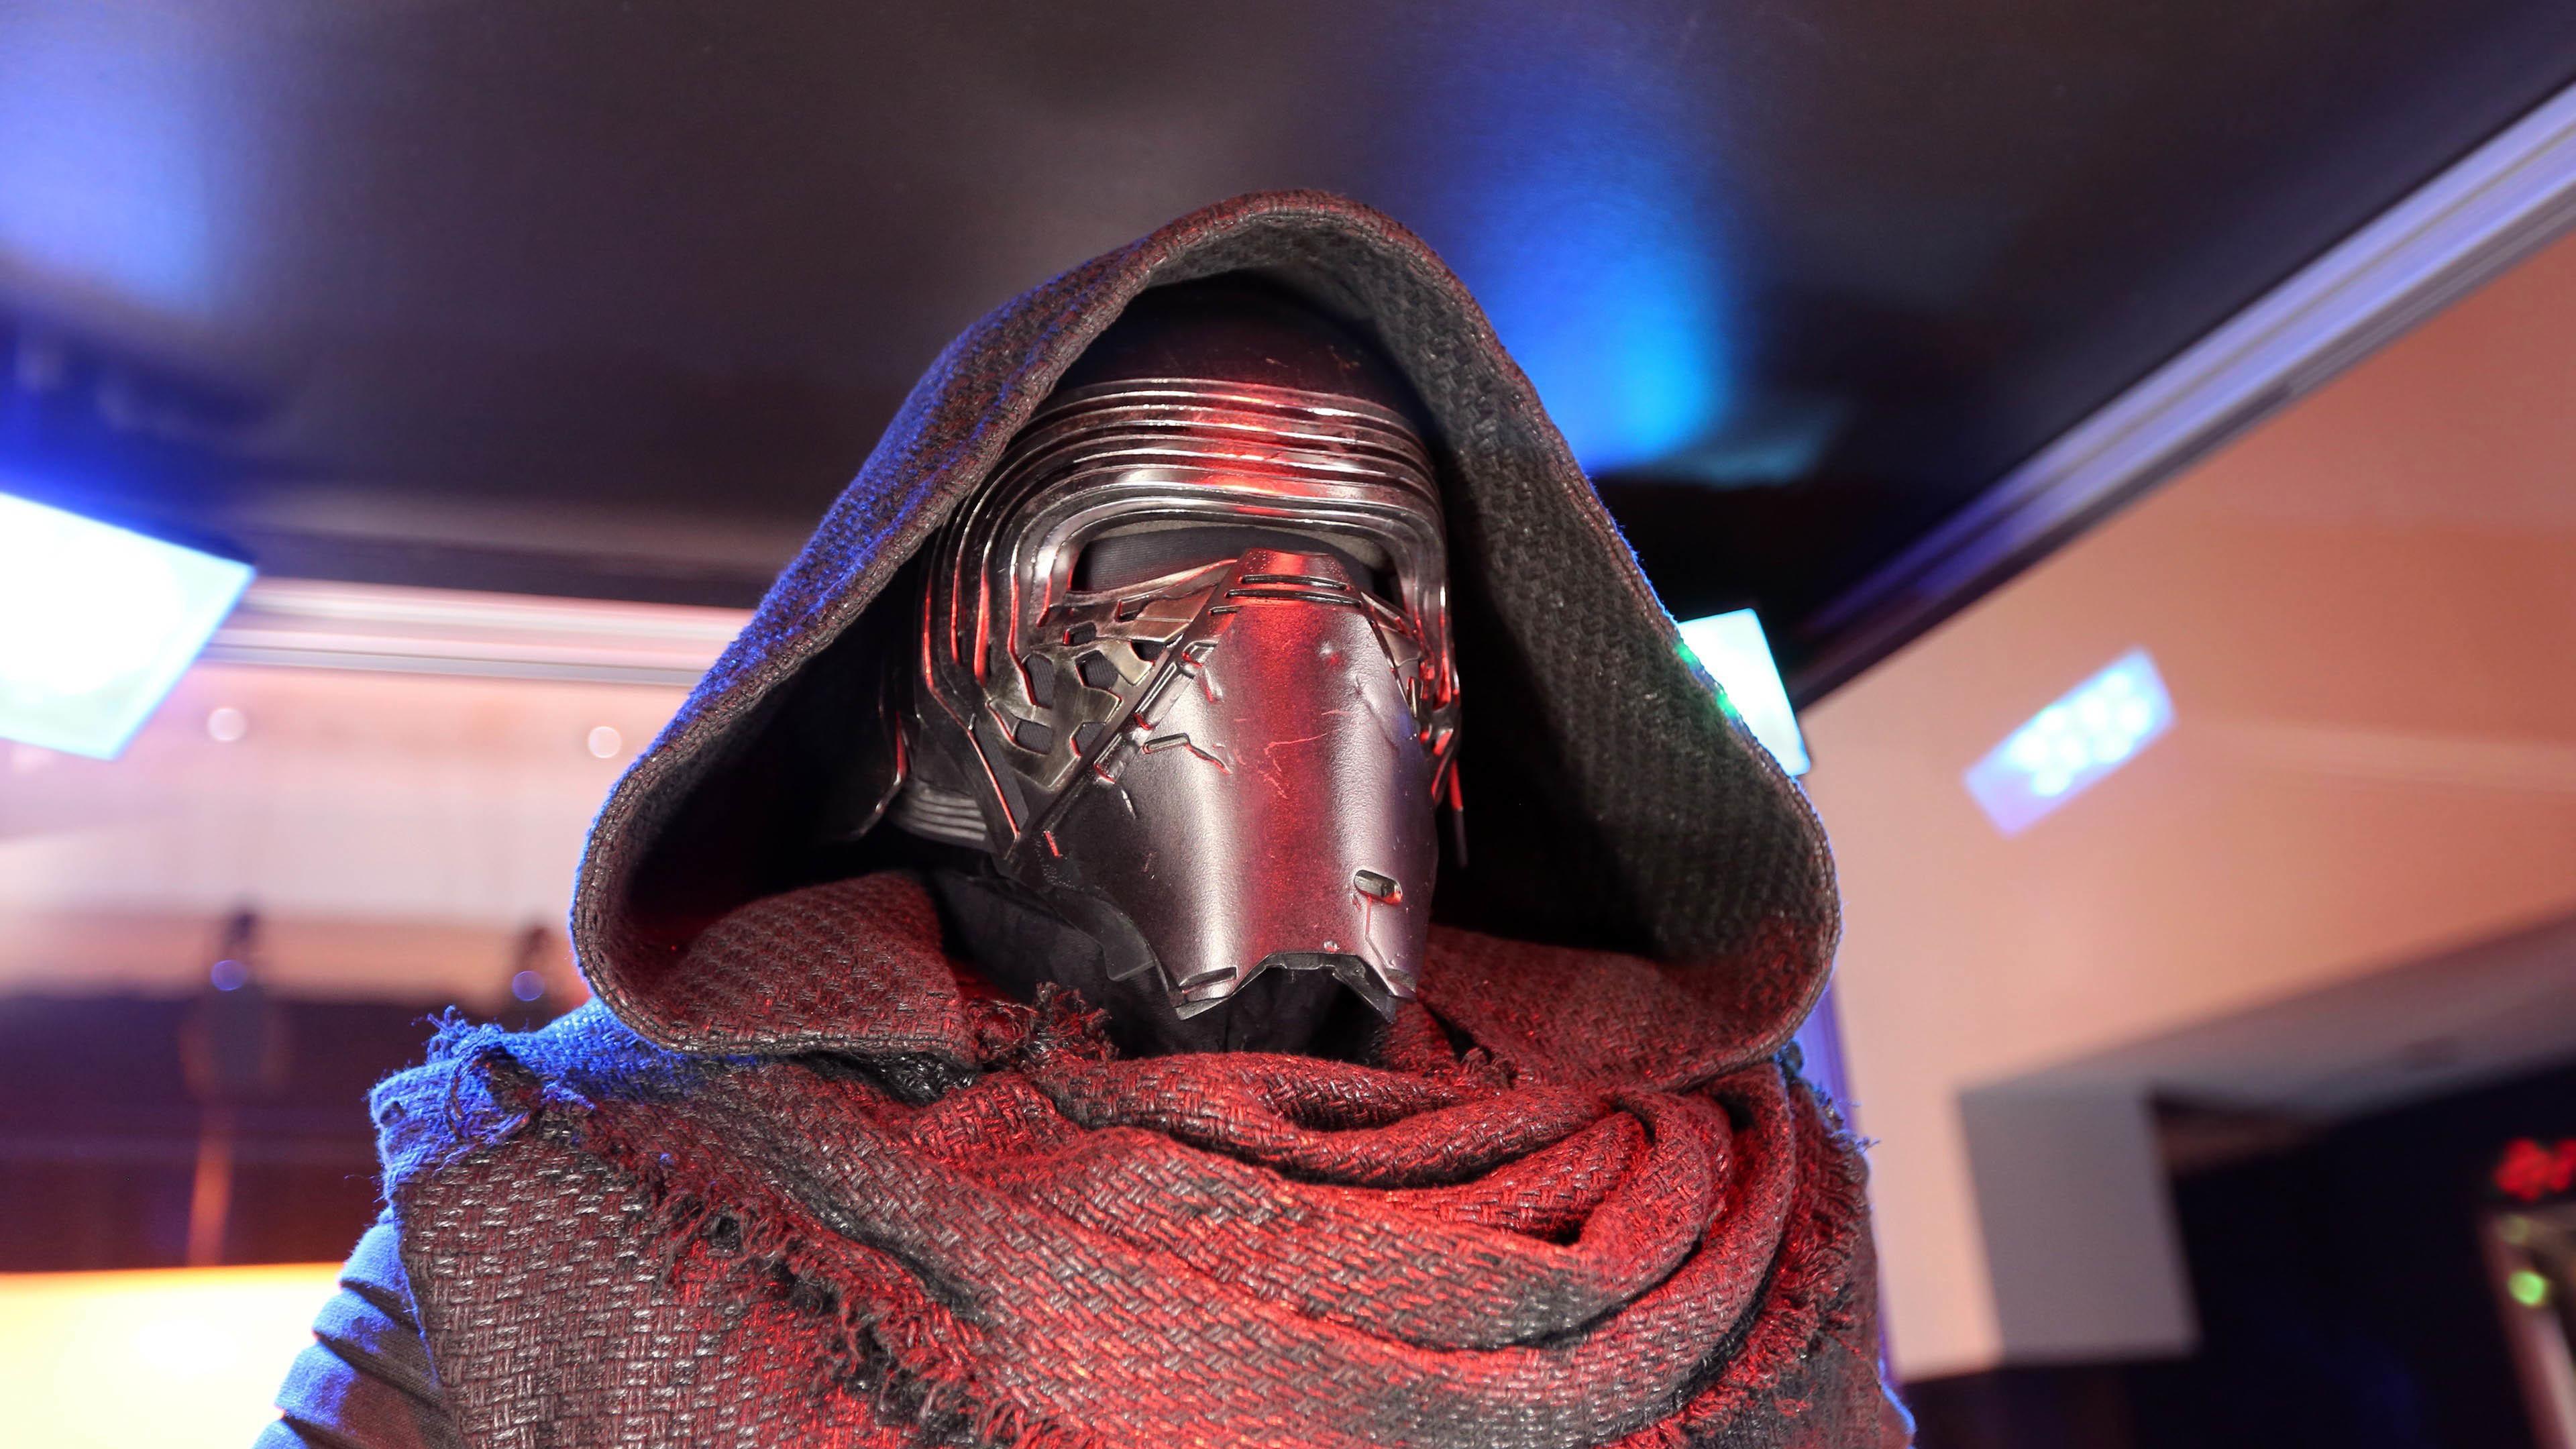 Adam Driver as Kylo Ren – Star Wars: The Force Awakens wallpaper